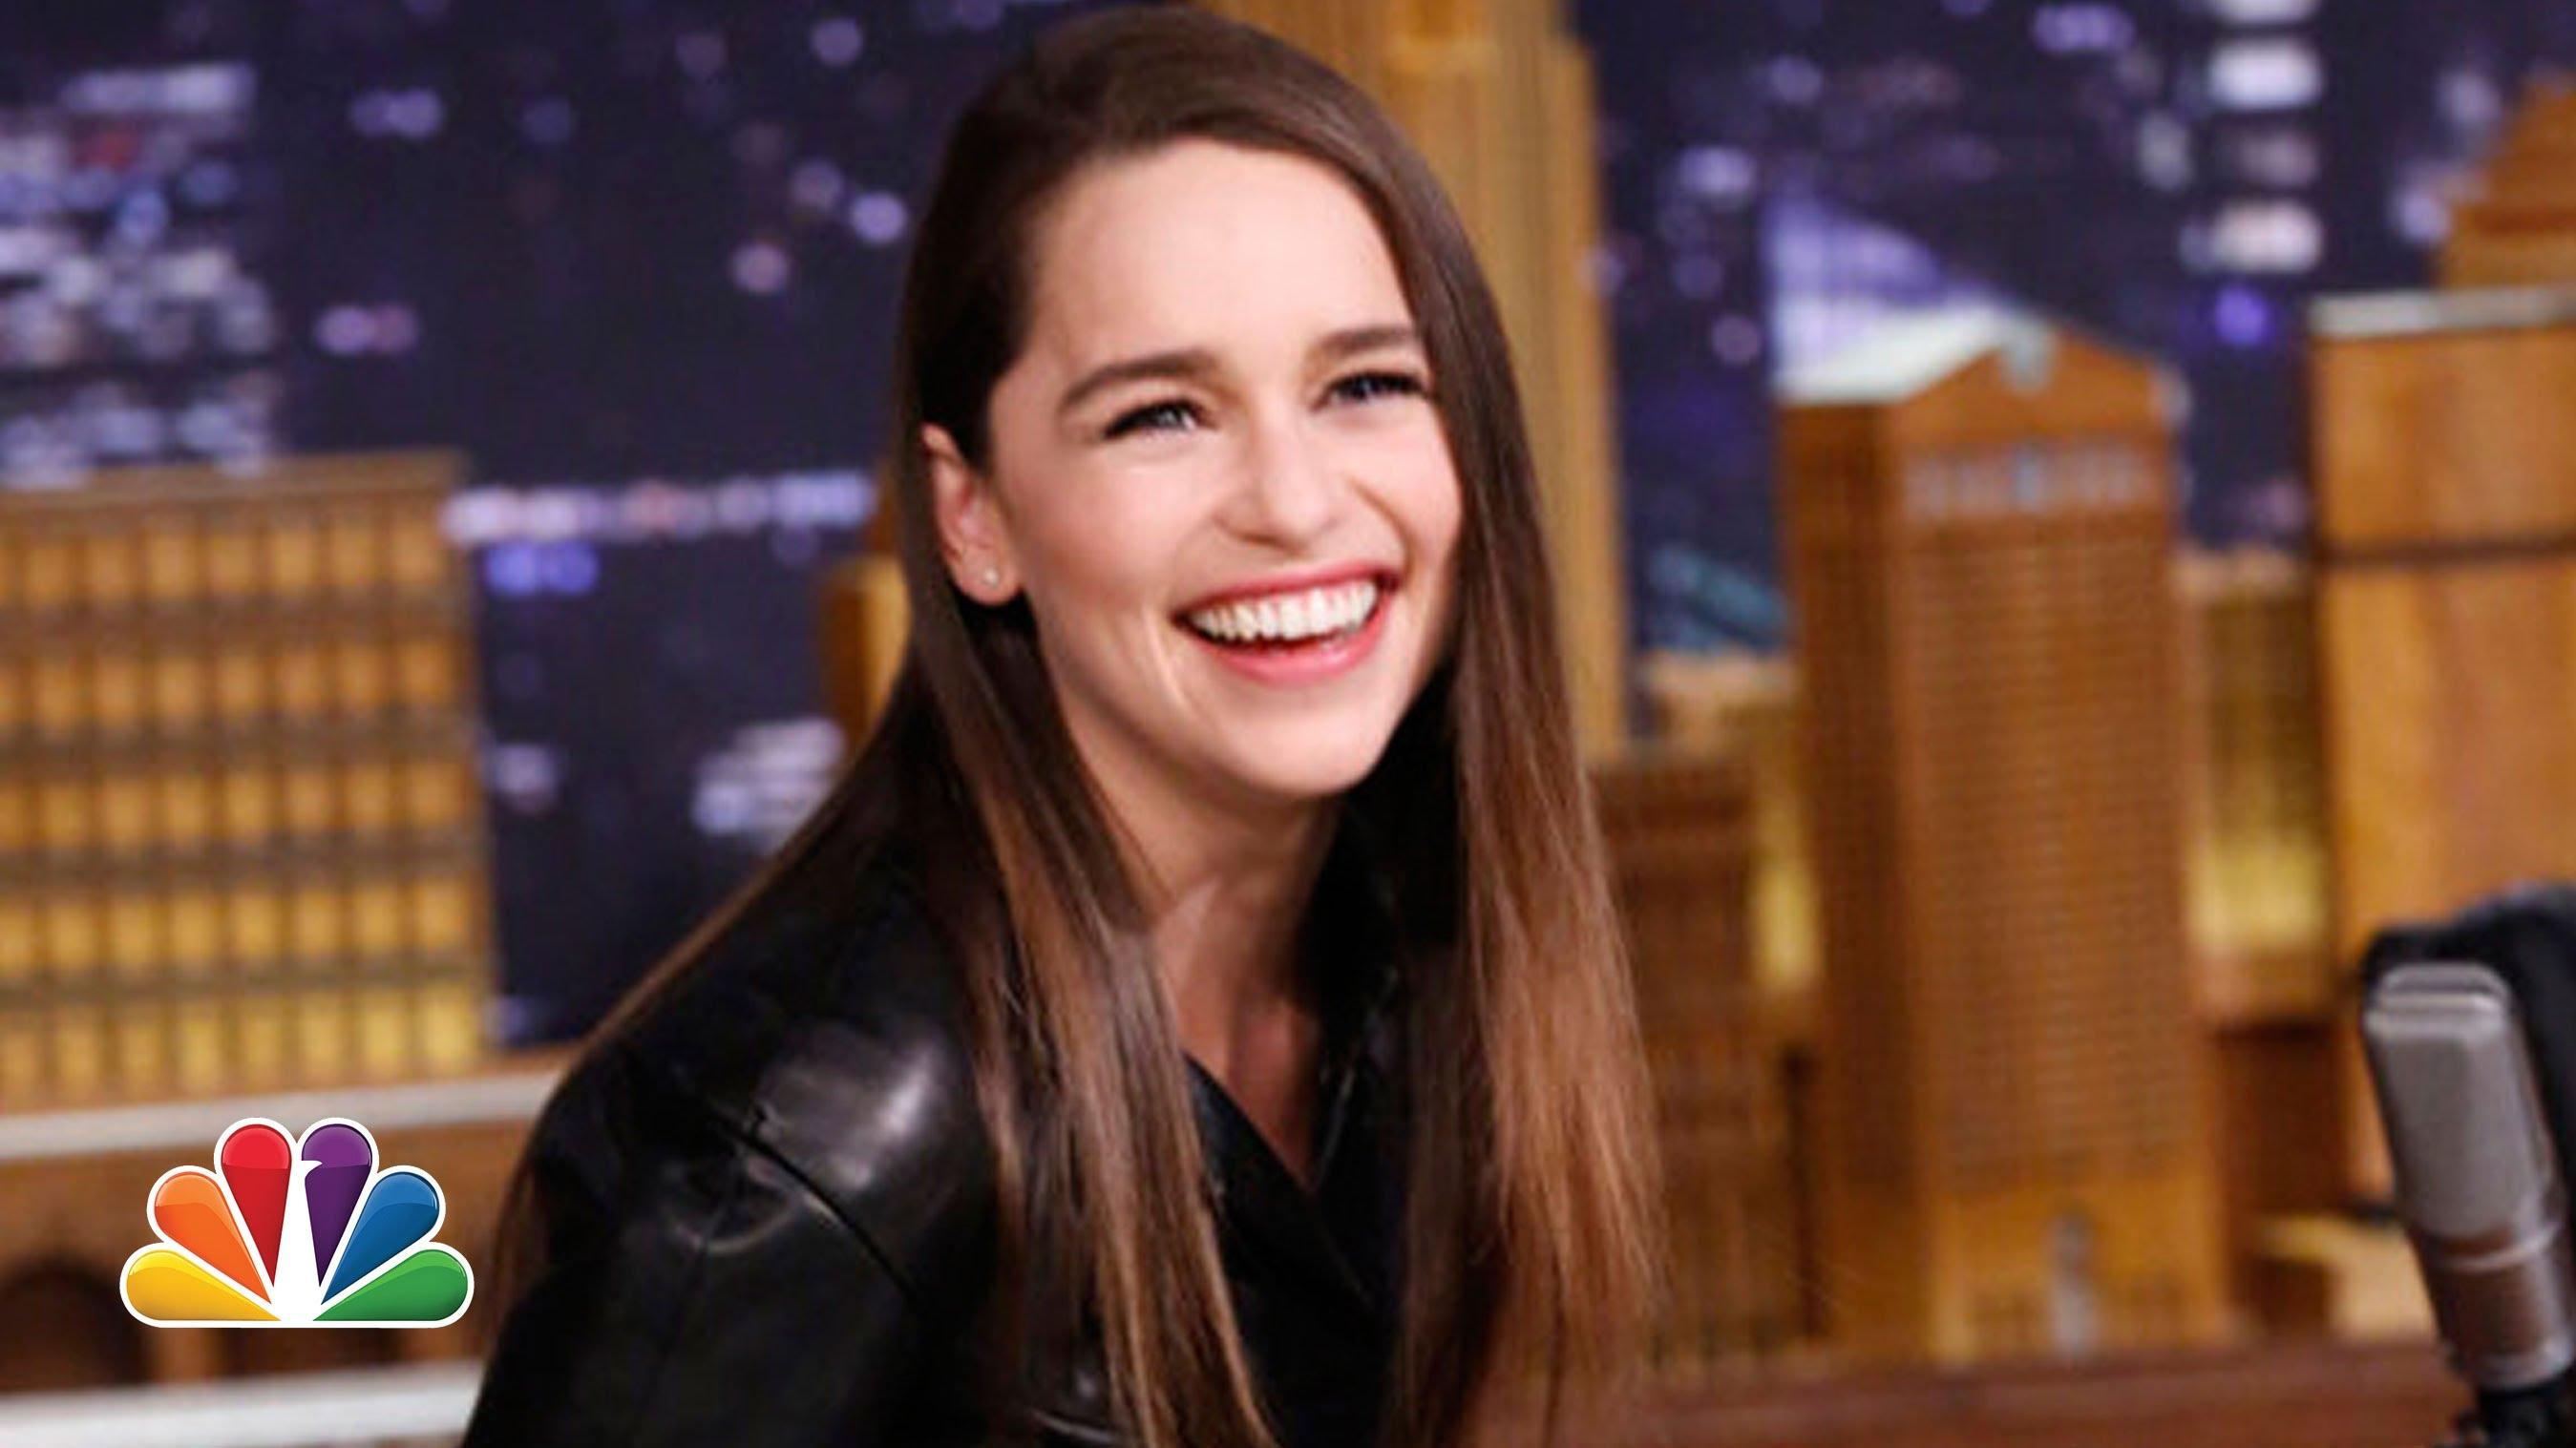 Game of Thrones: Emilia Clarke tells story of meeting Jason Momoa Game of Thrones: Emilia Clarke tells story of meeting Jason Momoa new picture